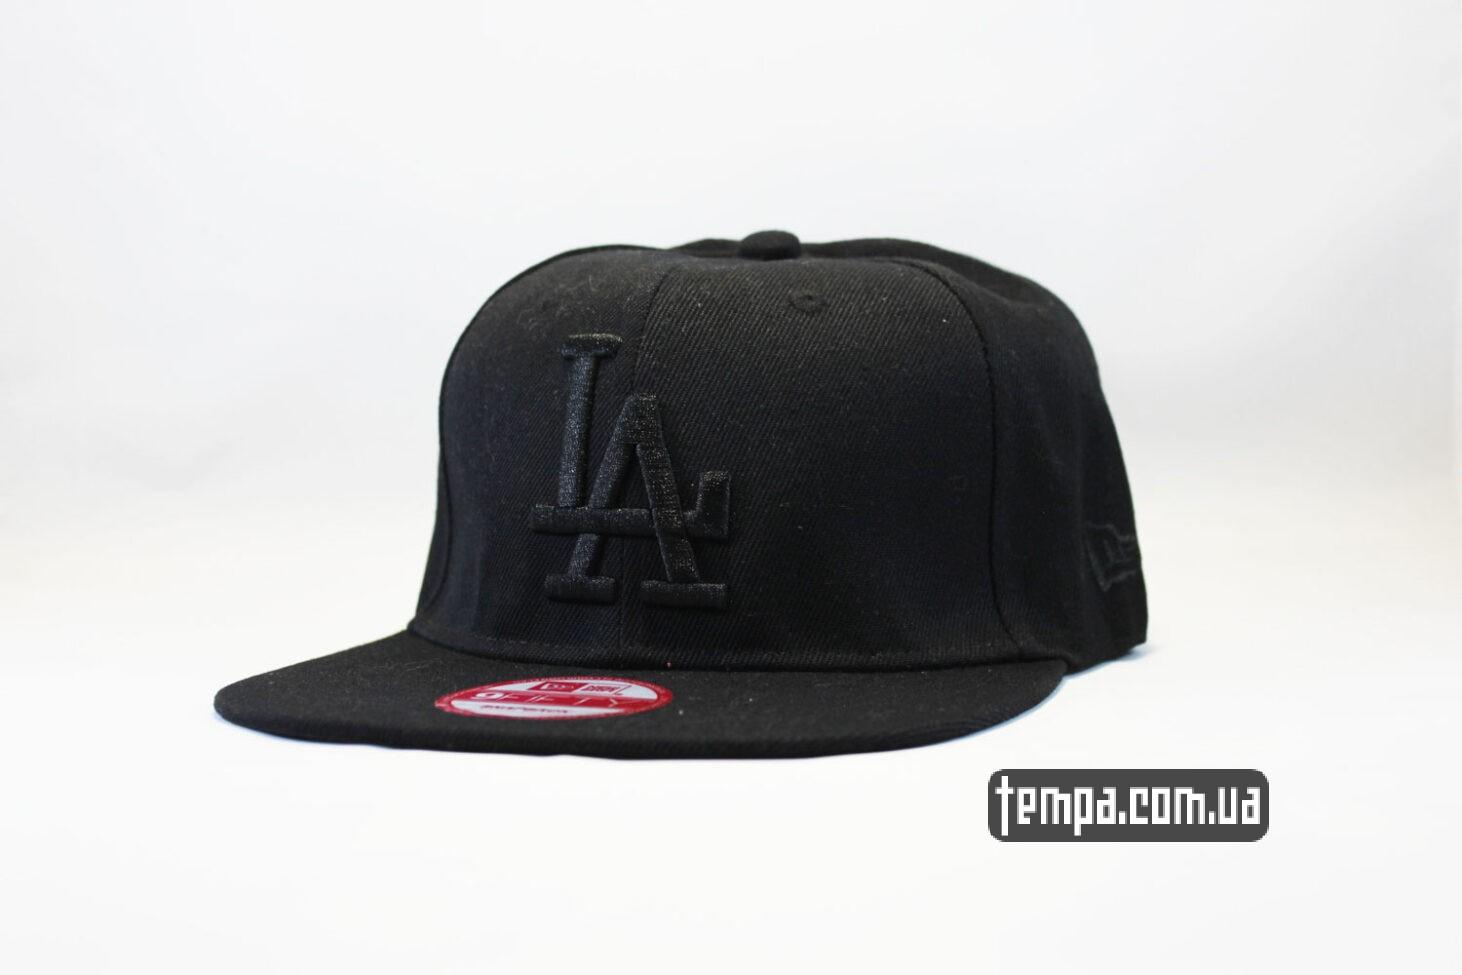 кепка snapback LA Los Angeles New Era 9fifty черная на черном